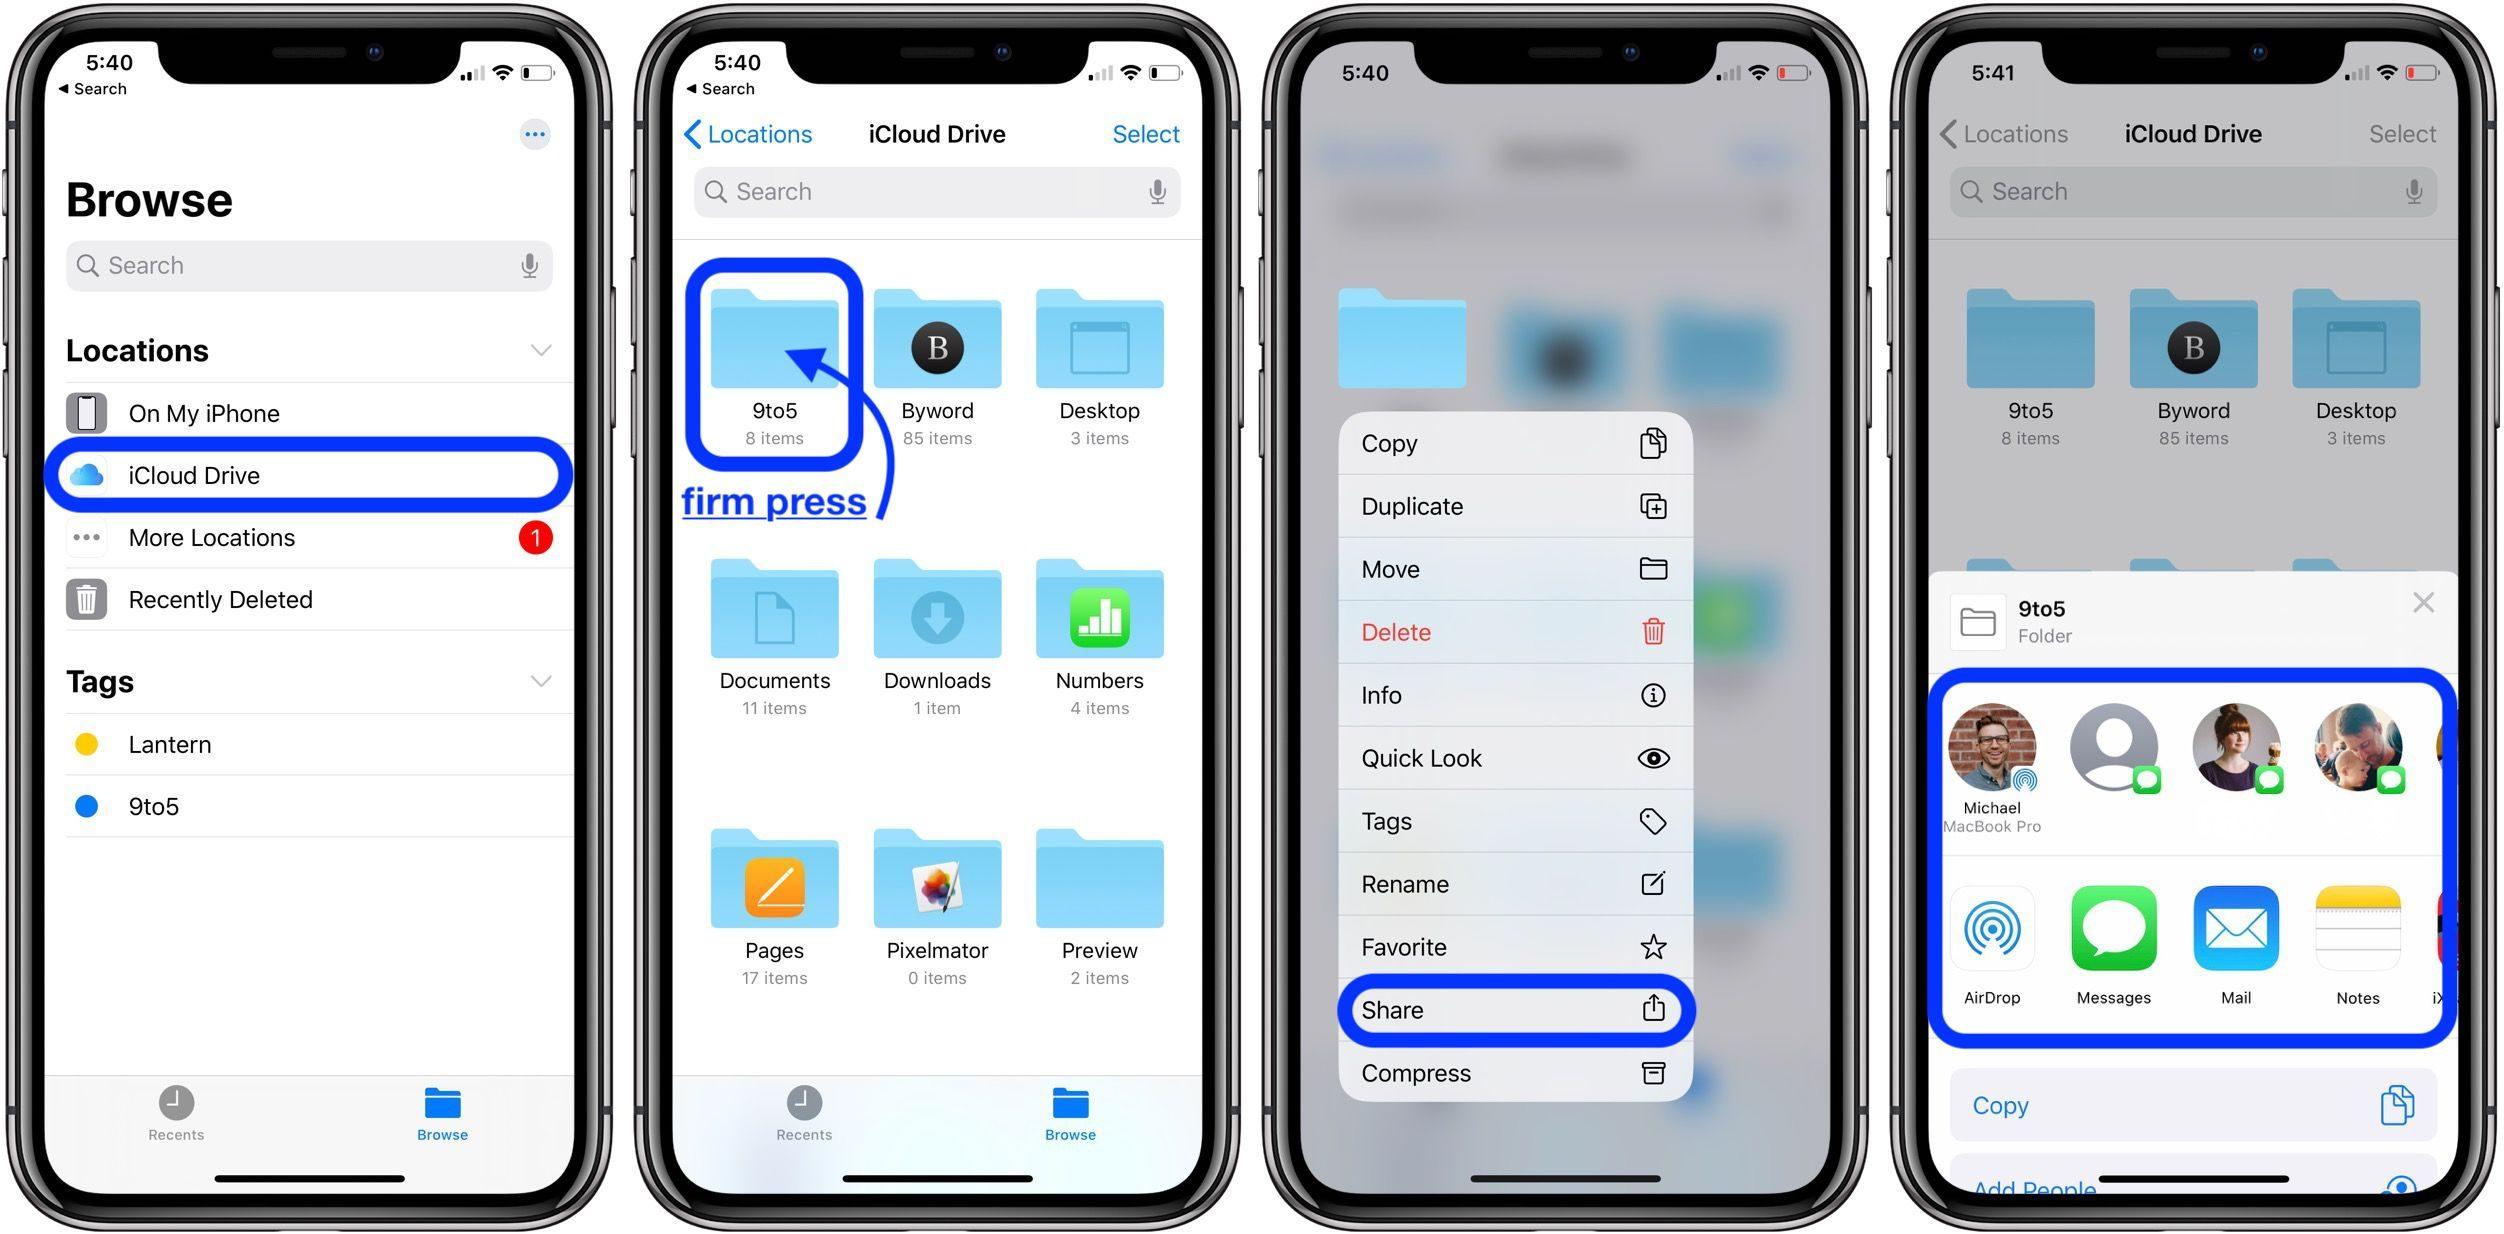 "<span href=""https://9to5mac.com/2020/03/24/share-icloud-drive-folders-iphone-ipad/"">iOS 13.4: Cómo compartir iCloud Drive carpetas del iPhone y el iPad</a>"